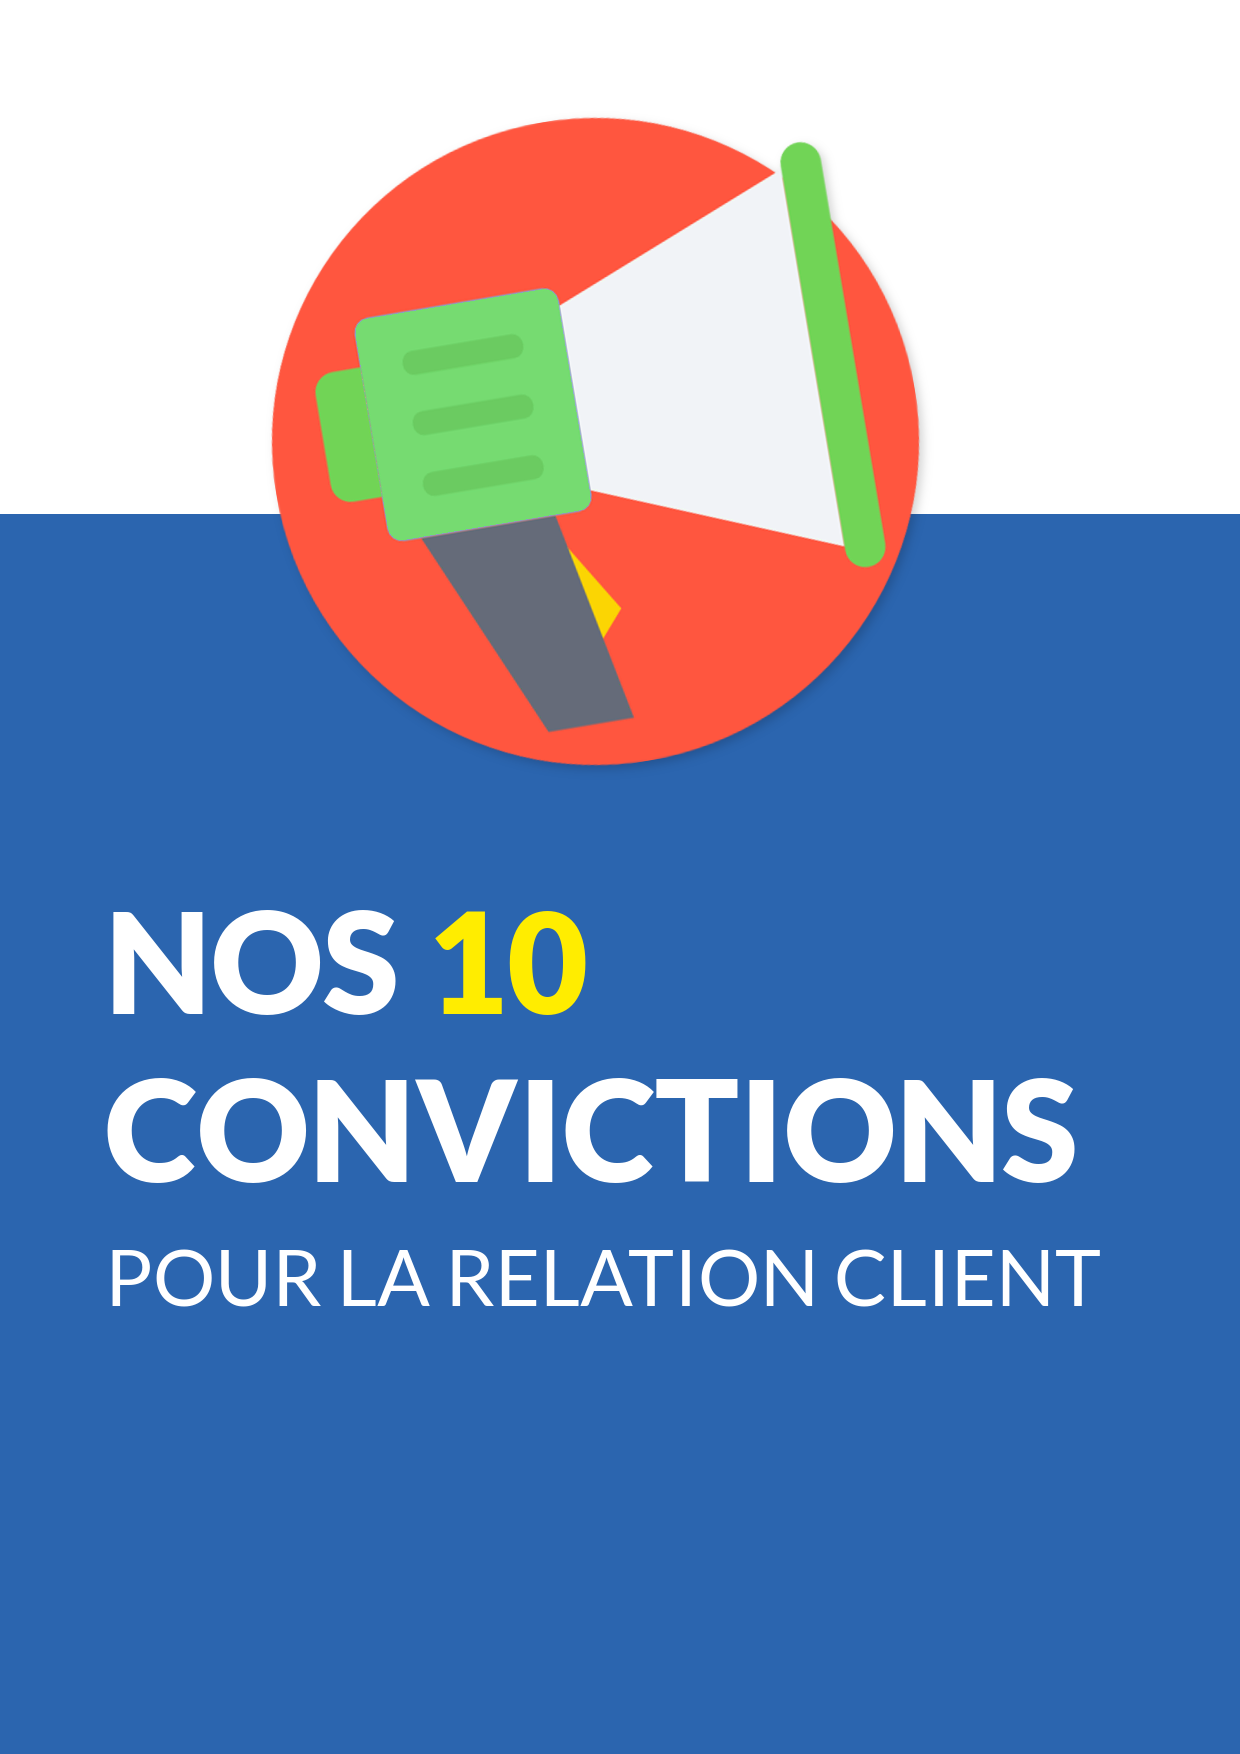 LP_convictions-01-3.png